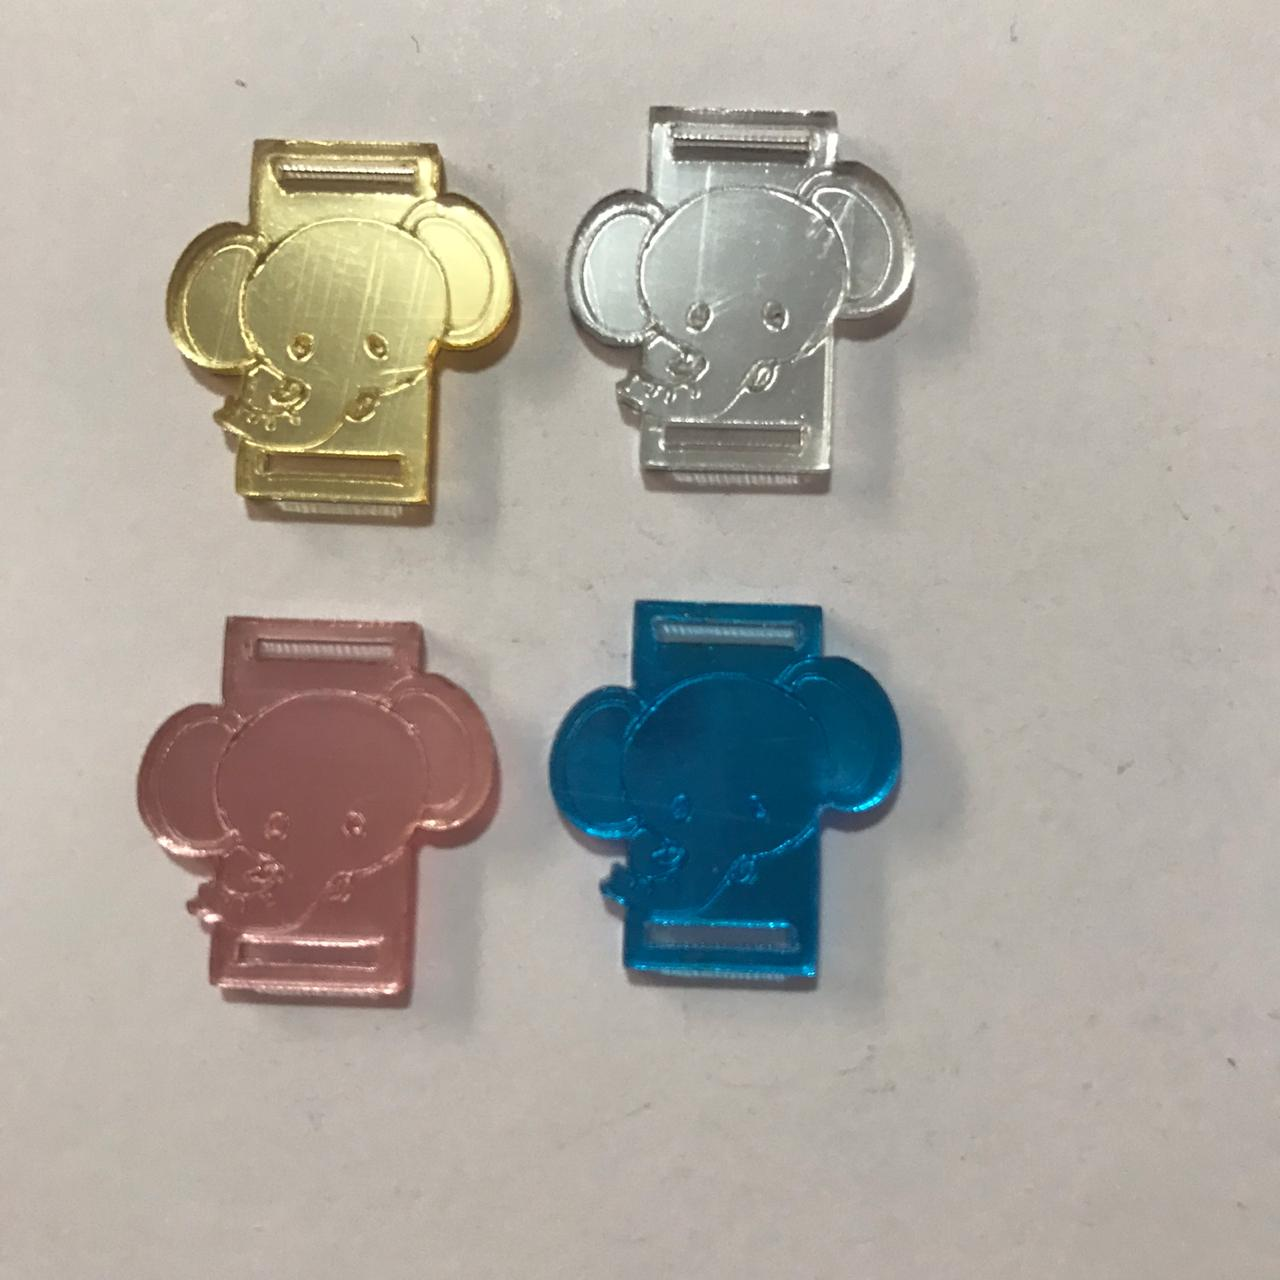 Passante para Elástico - Elefante - 2cm (10 unidades)